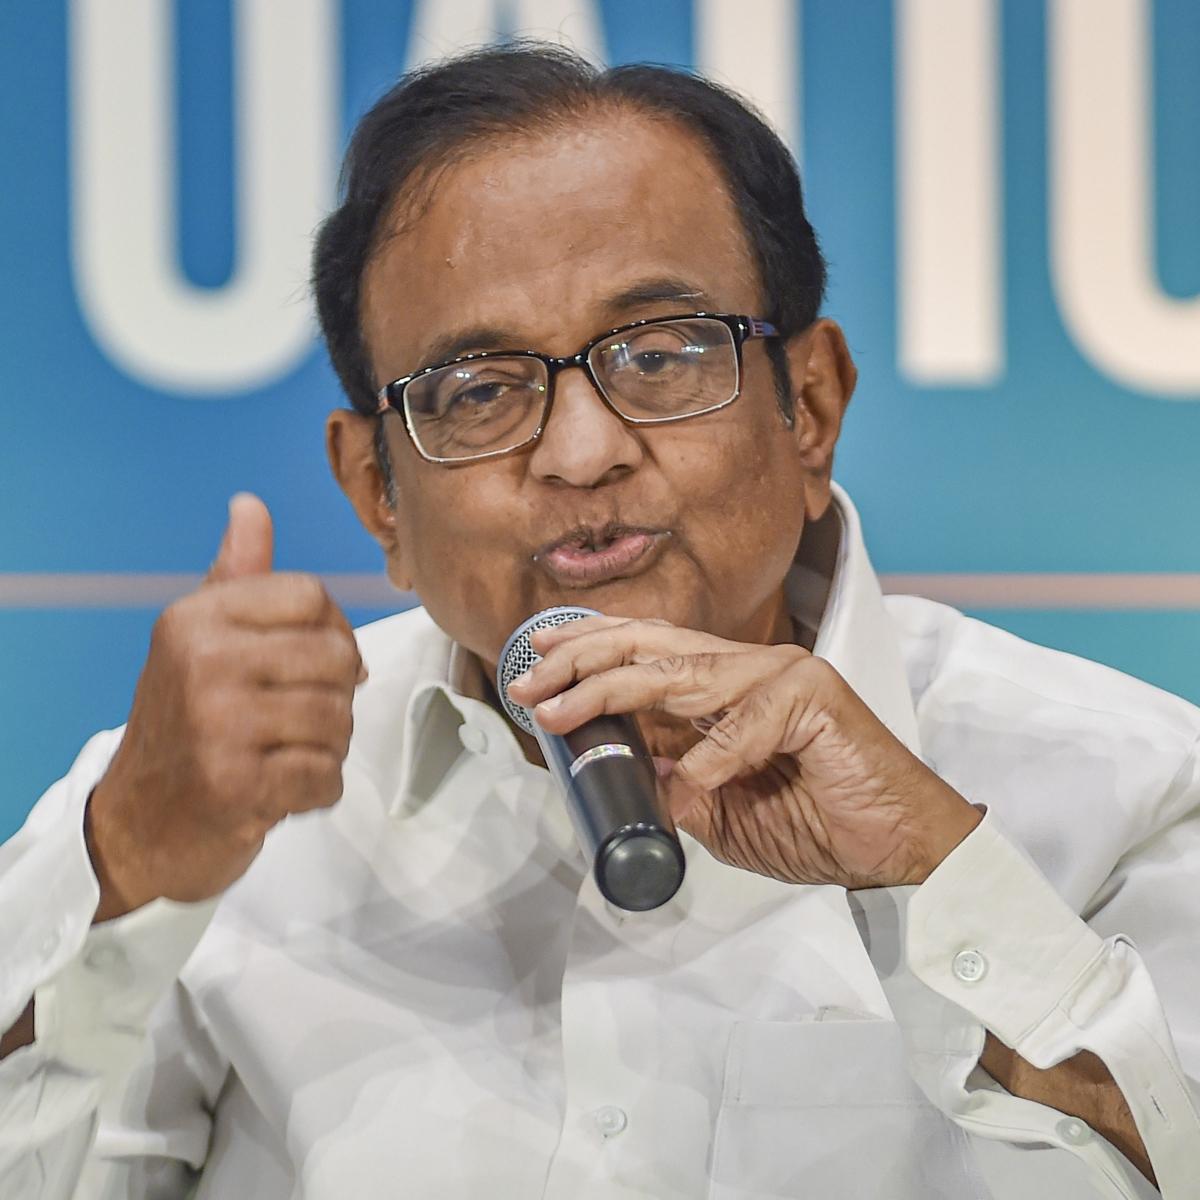 Who said BJP cannot be defeated?: P Chidambaram amid Bihar polls